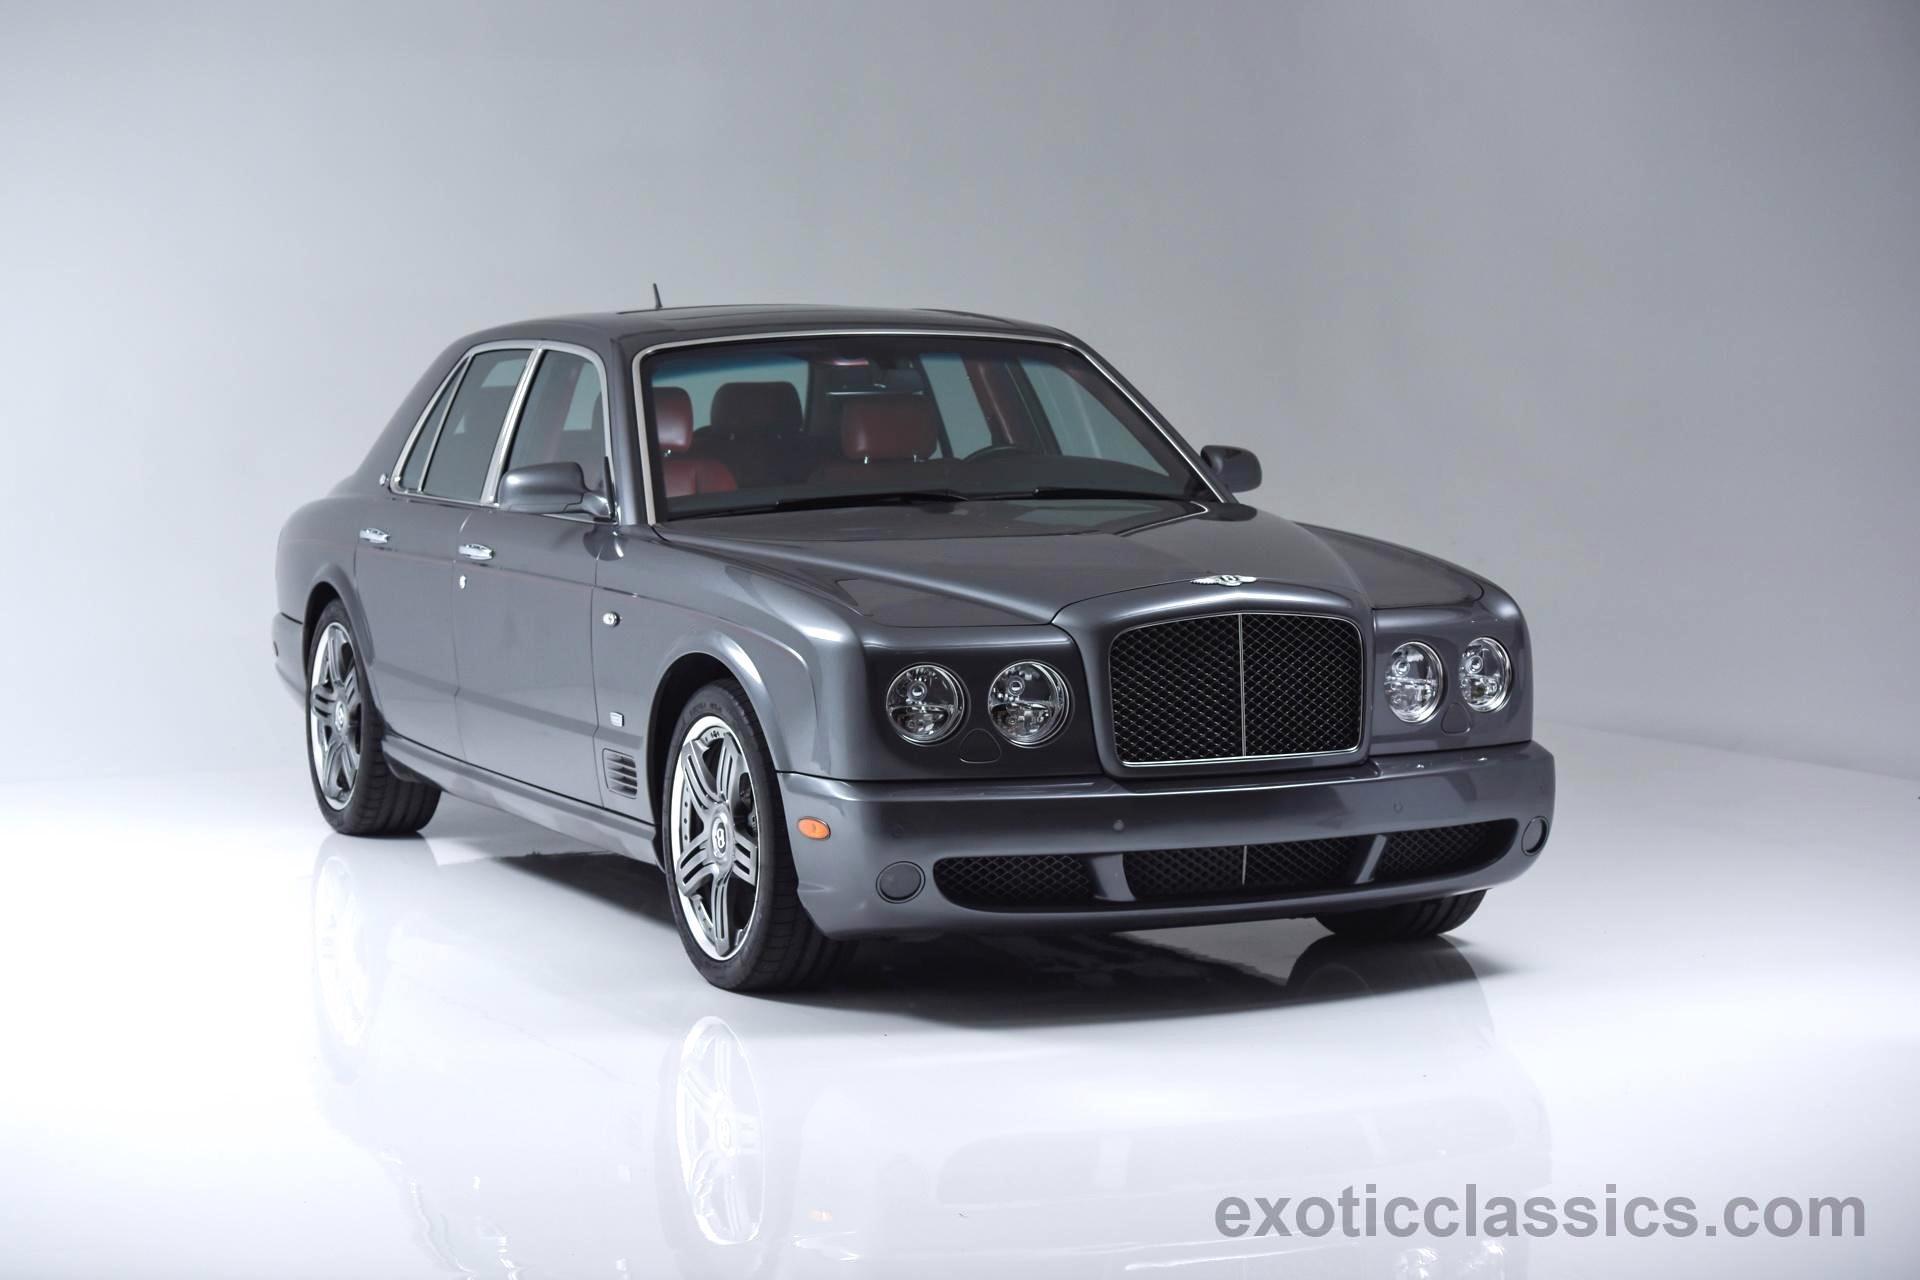 2009 bentley arnage t mulliner edition exotic classic car dealership new york l champion. Black Bedroom Furniture Sets. Home Design Ideas